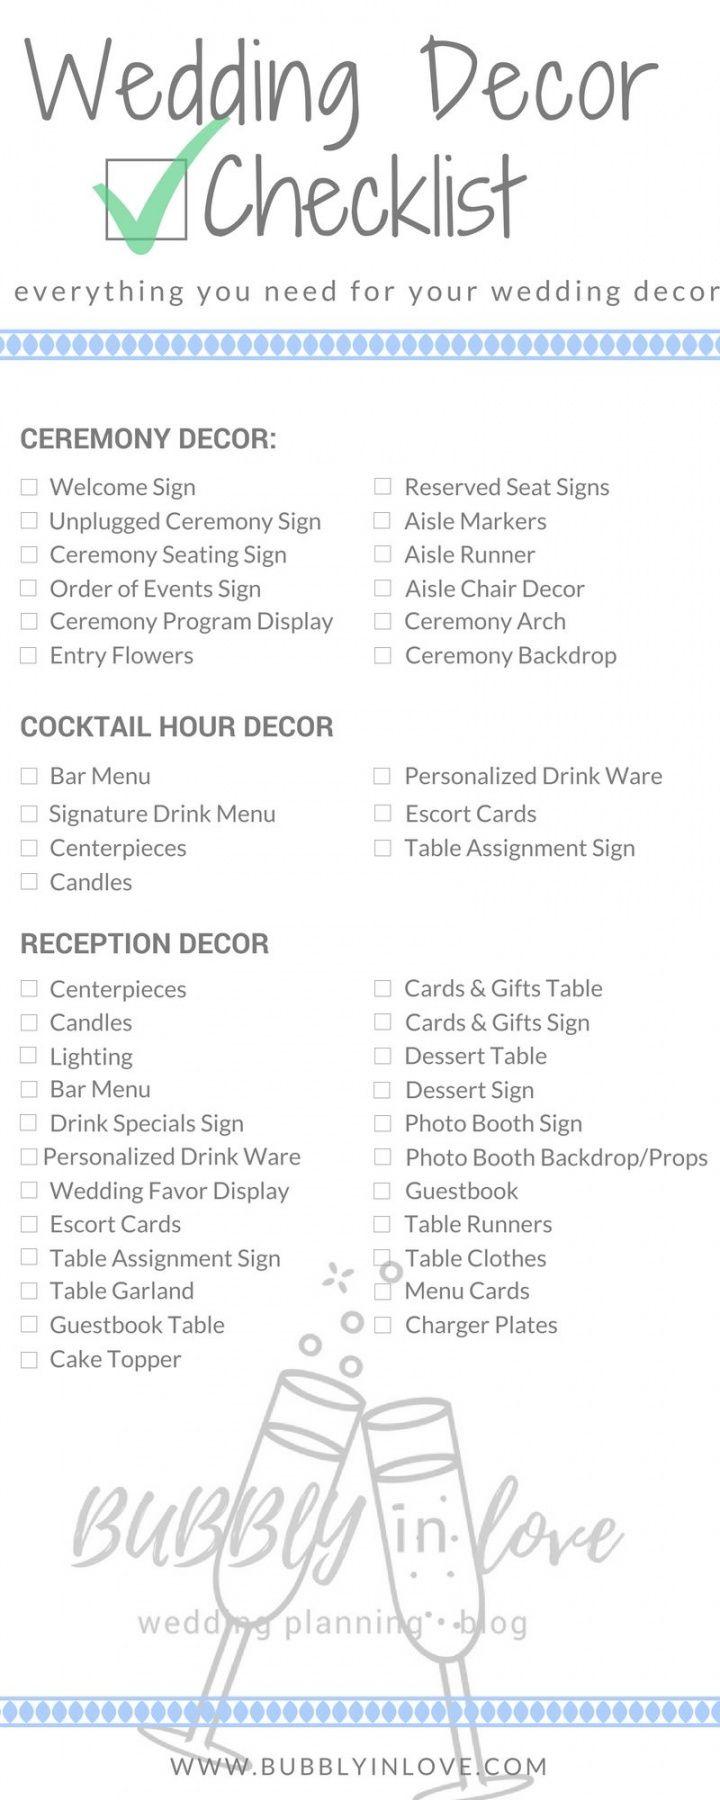 editable wedding decor checklist — everything you need to plan your wedding wedding decoration checklist template excel